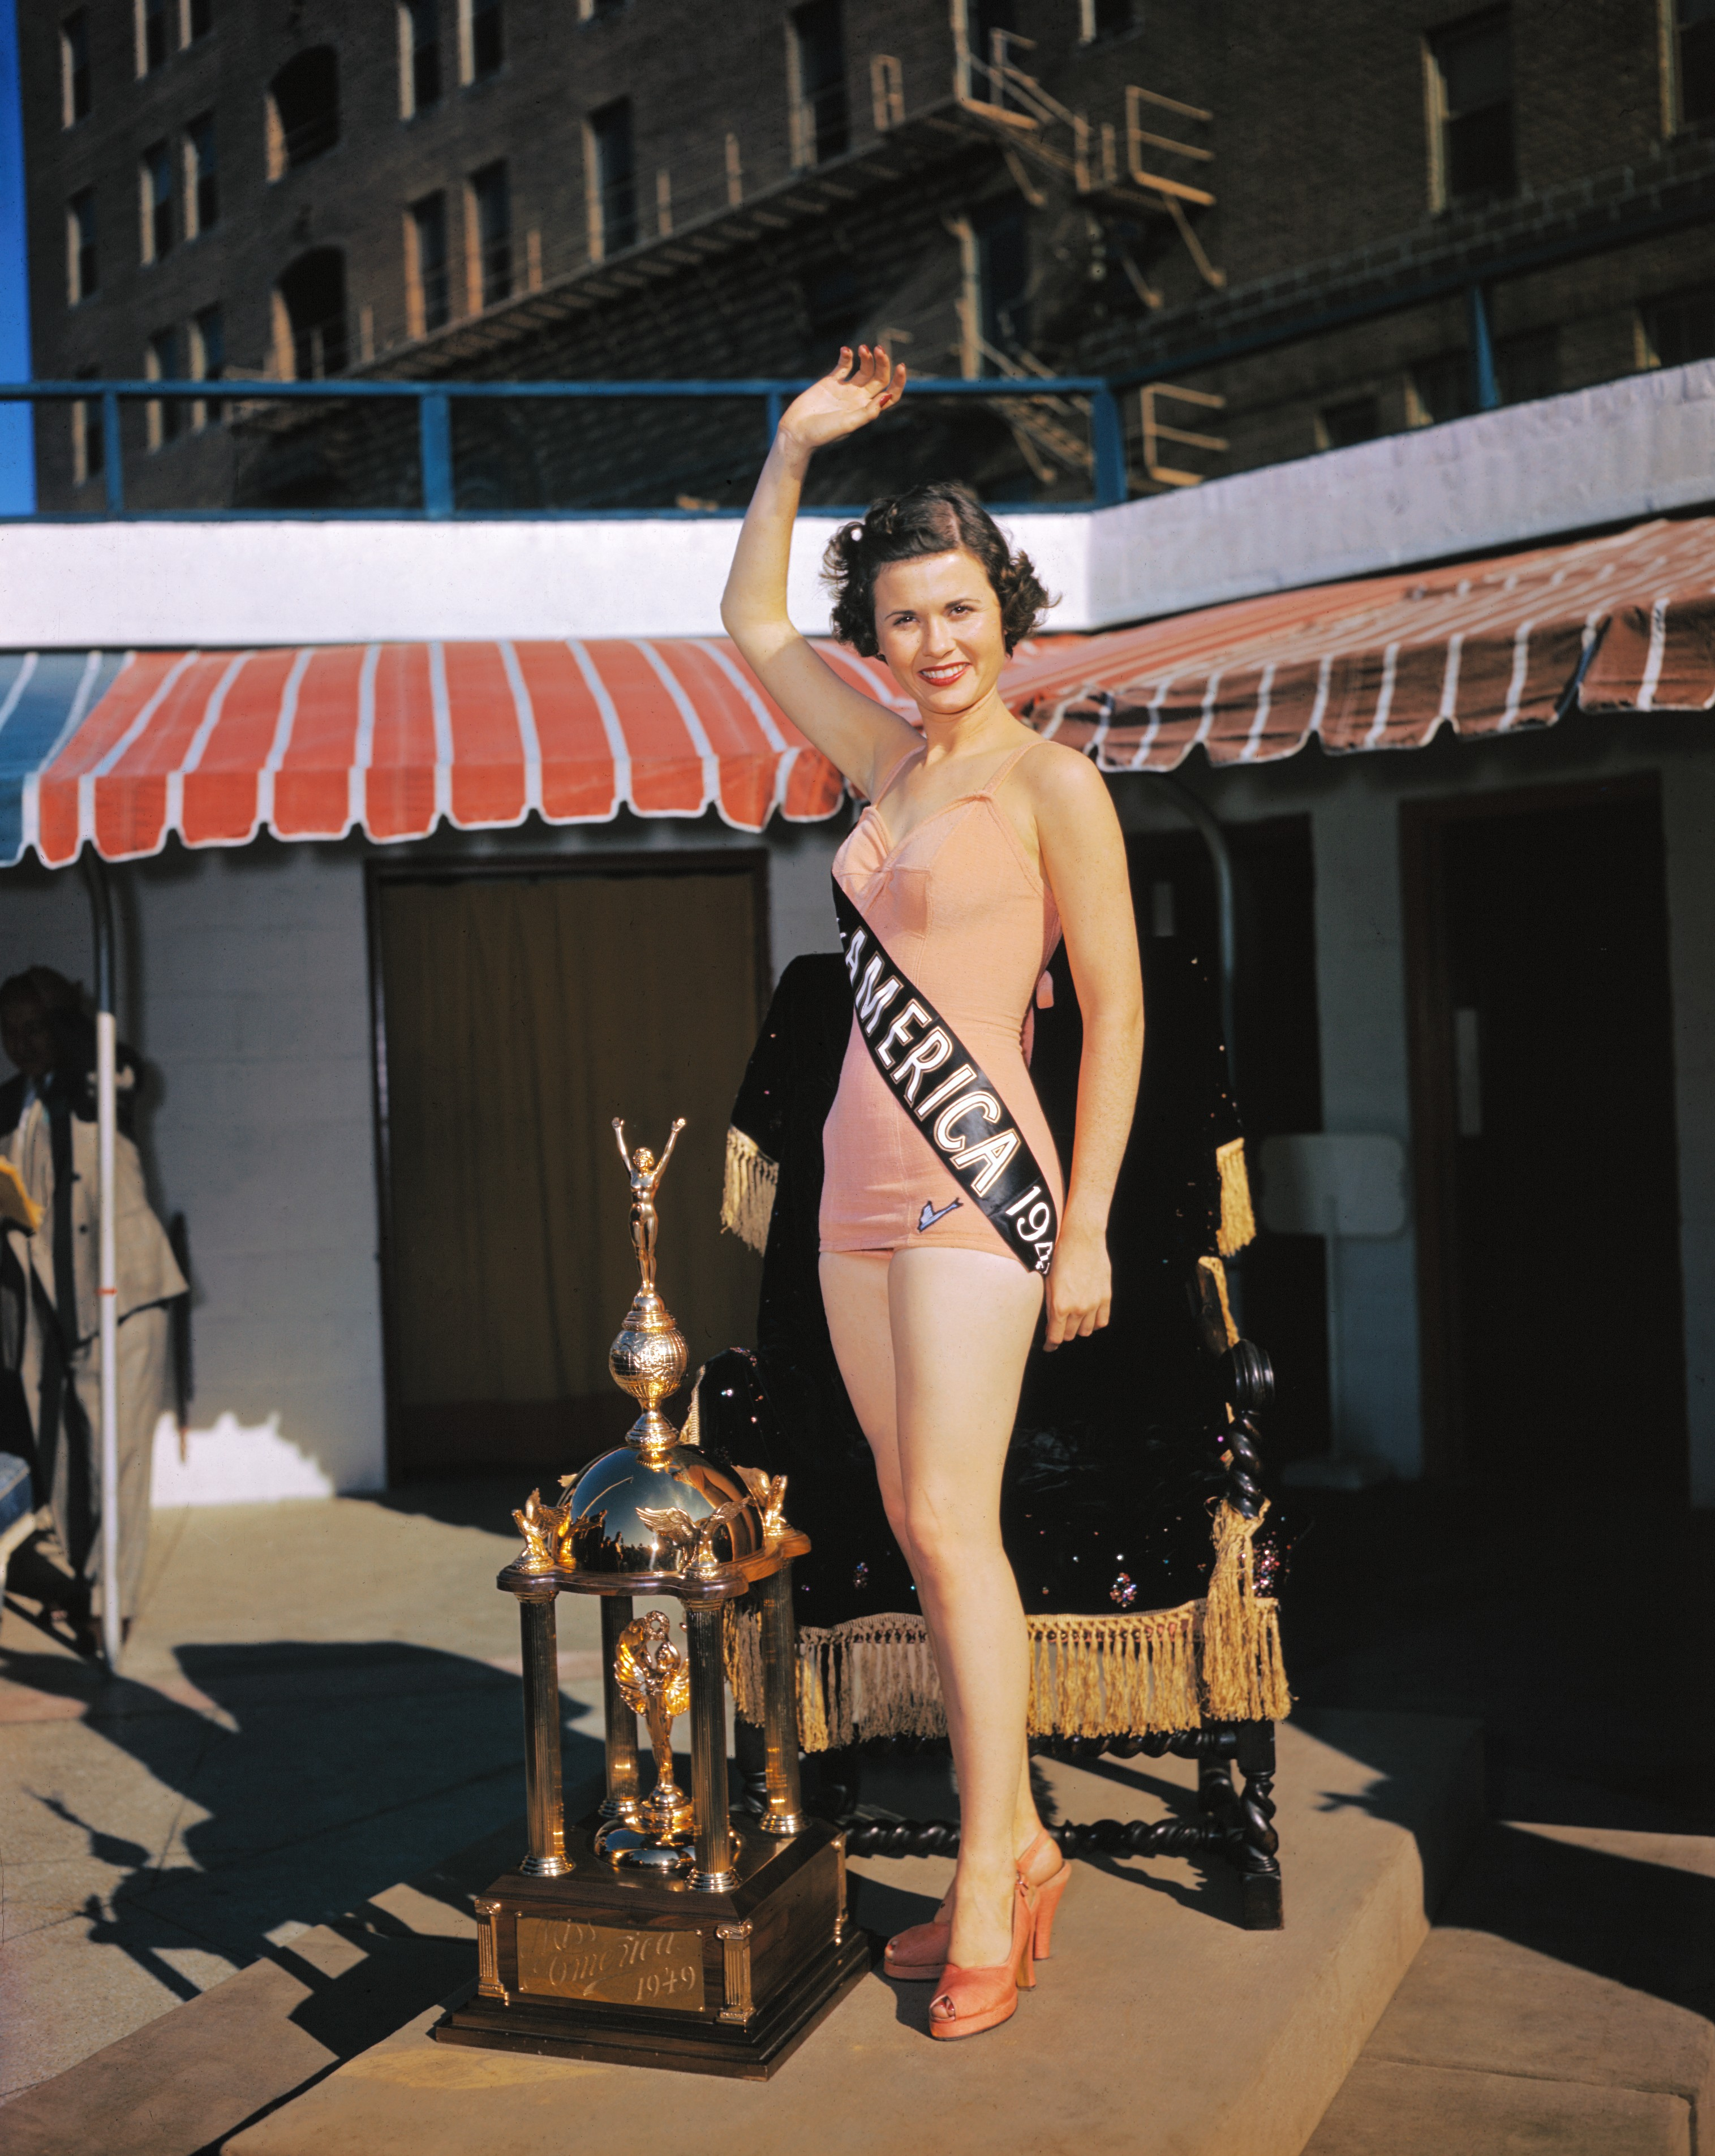 1949: Jacque Mercer from Litchfield, Ariz.